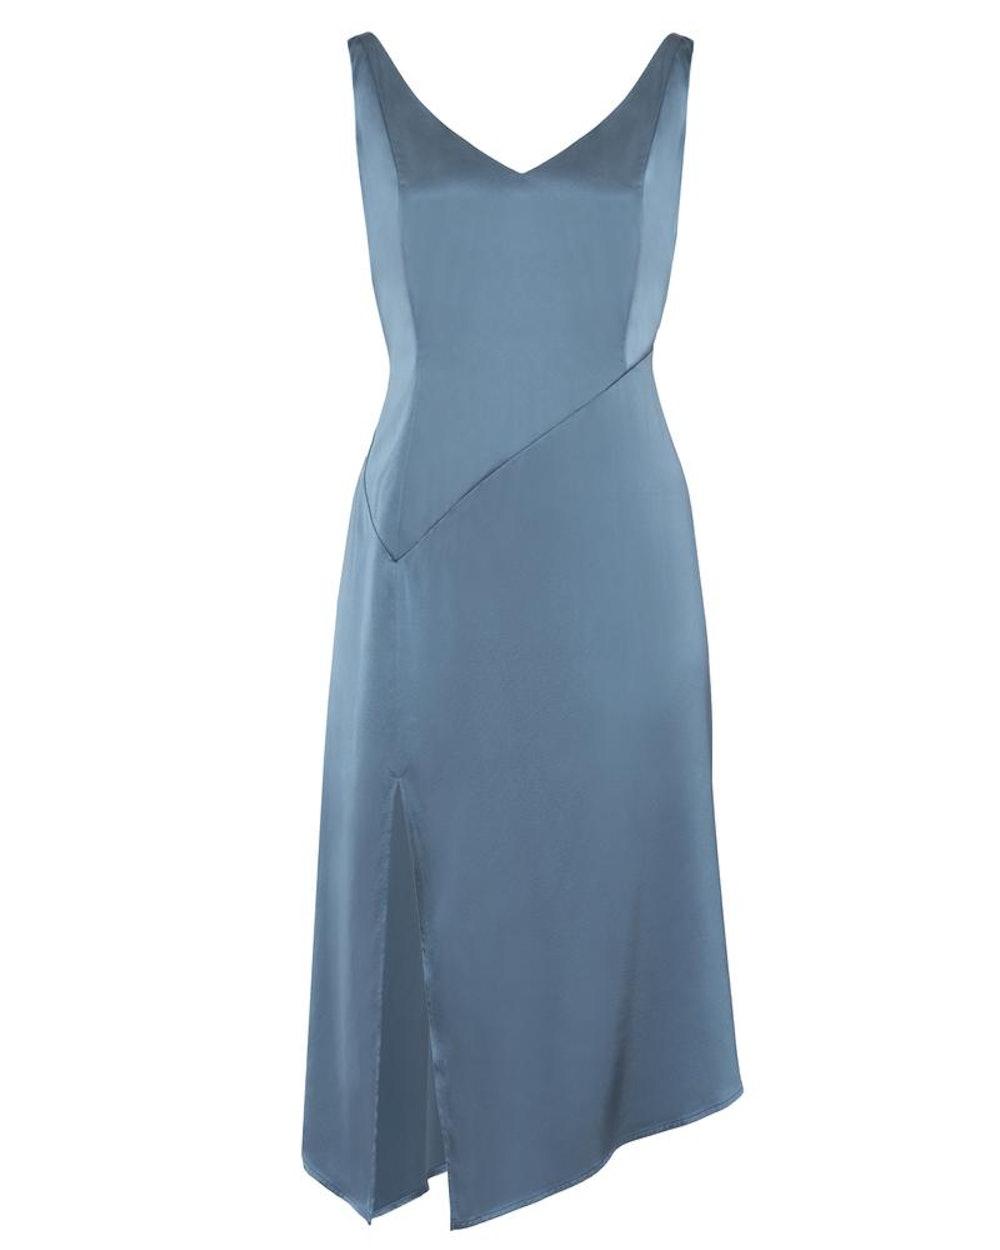 Nia Dress